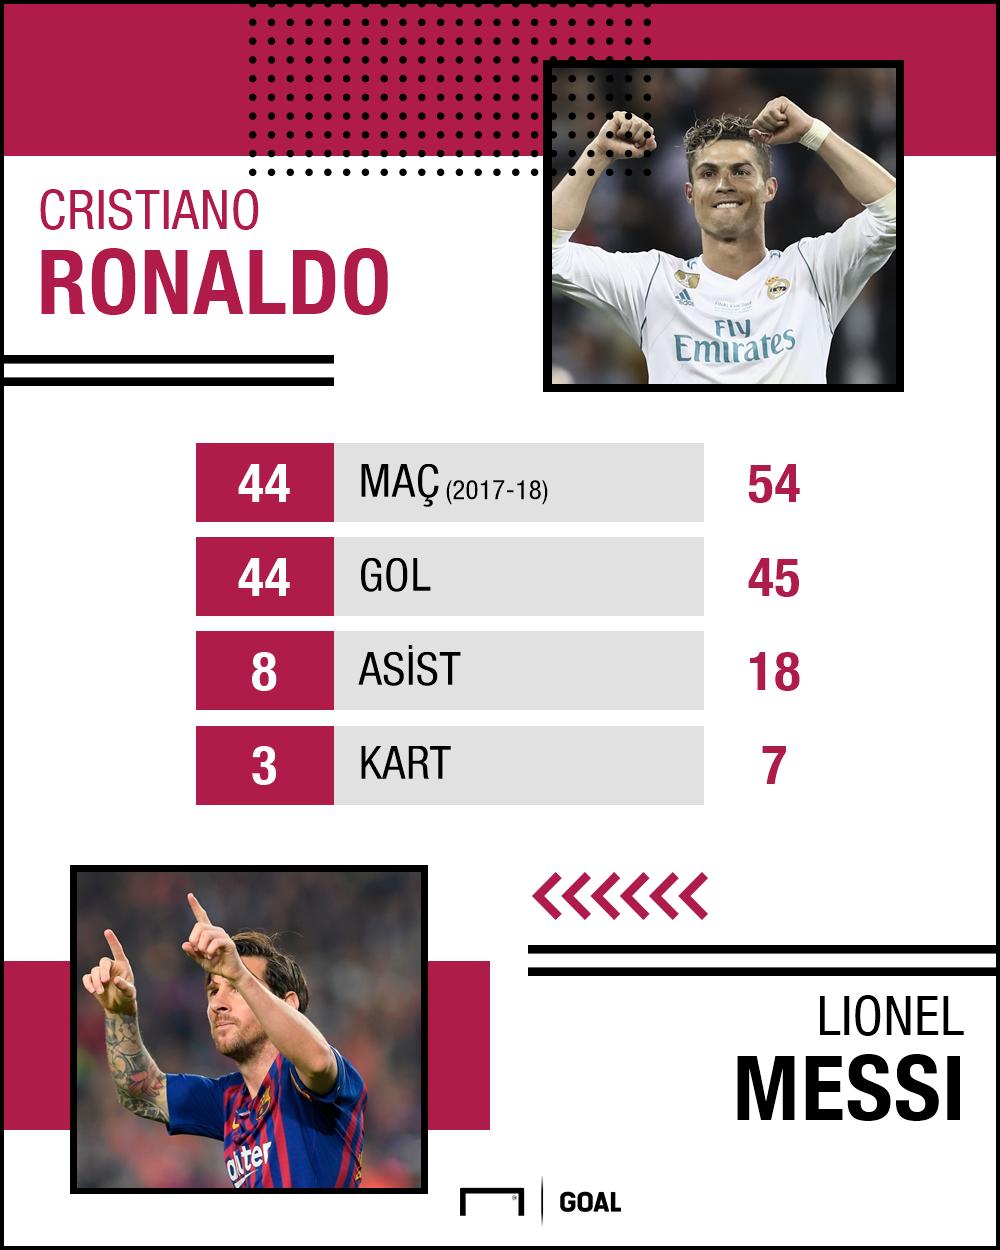 Messi Ronaldo GFX